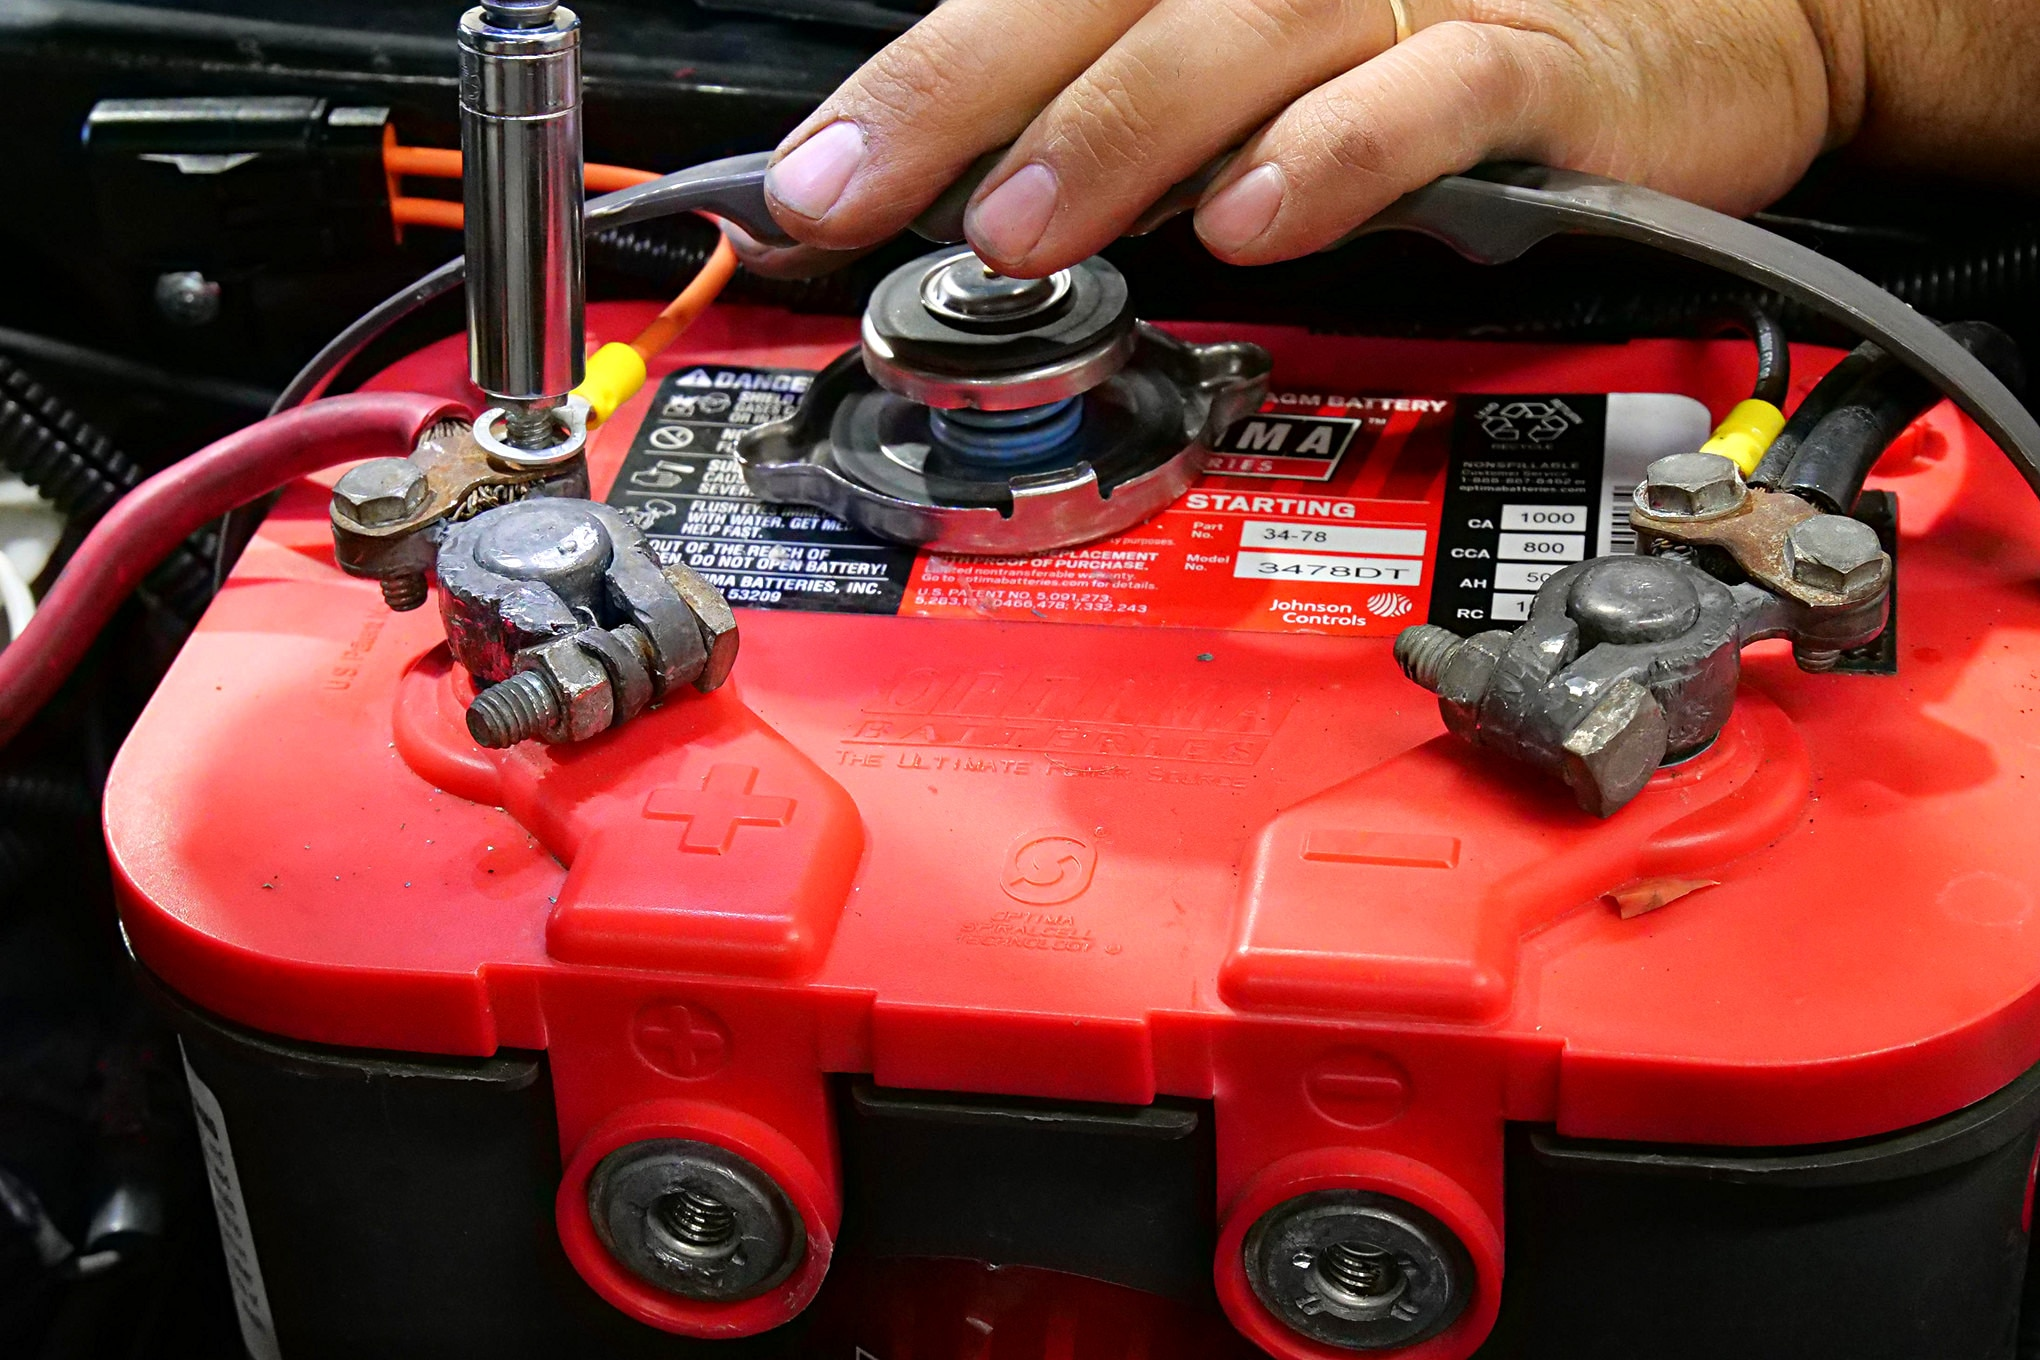 017 Mustang Battery Terminal Fan Wiring